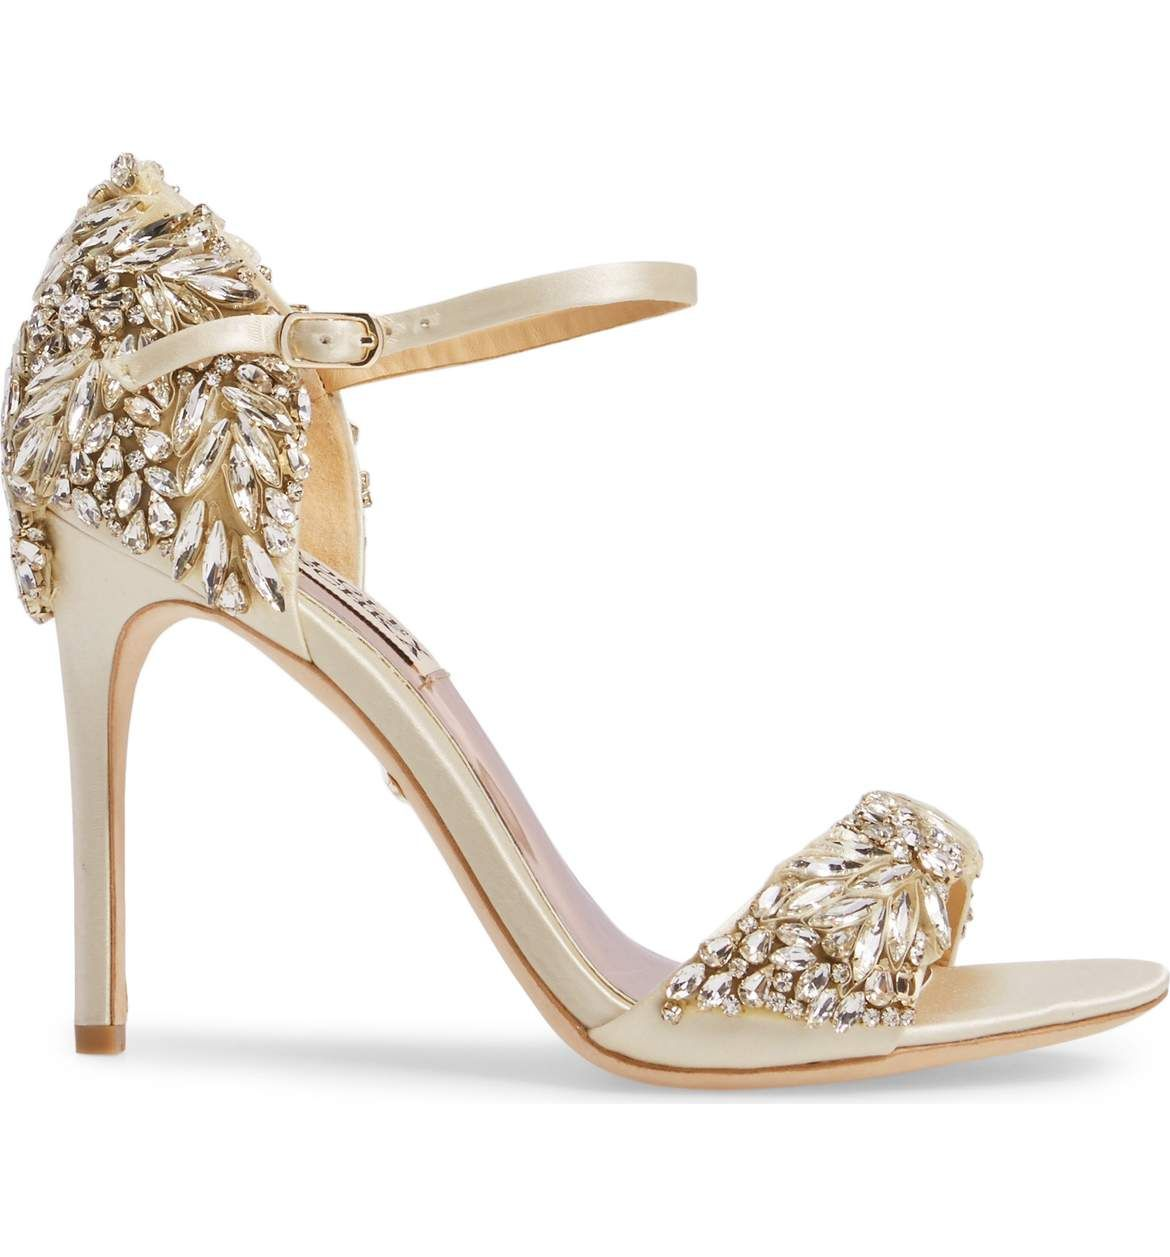 Badgley Mischka Tampa Ankle Strap Sandal (Women) | Nordstrom